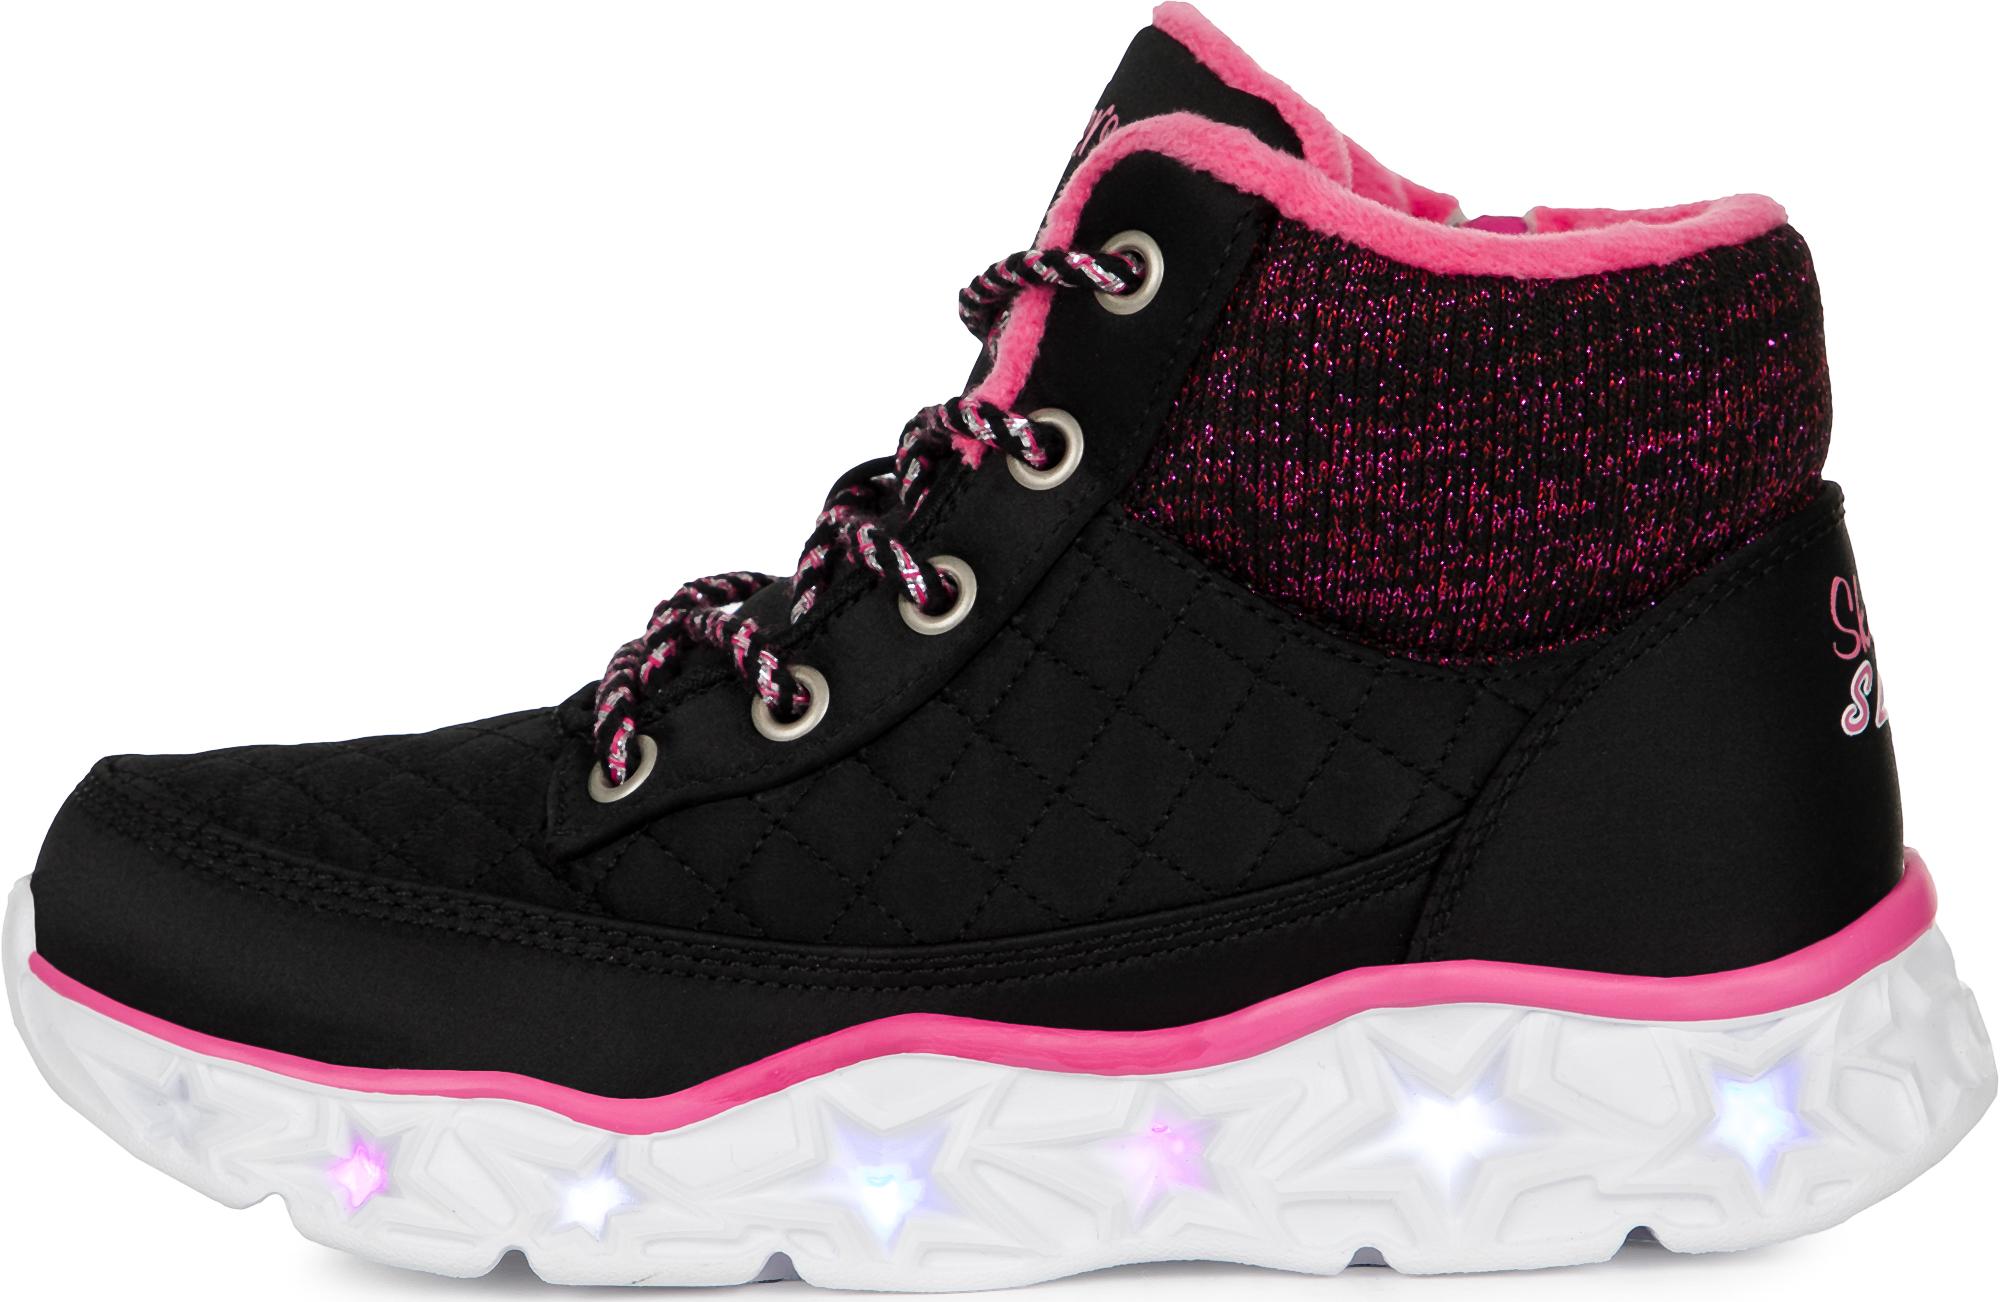 Skechers Ботинки утепленные для девочек Galaxy Lights-Snuggle Brights, размер 34,5